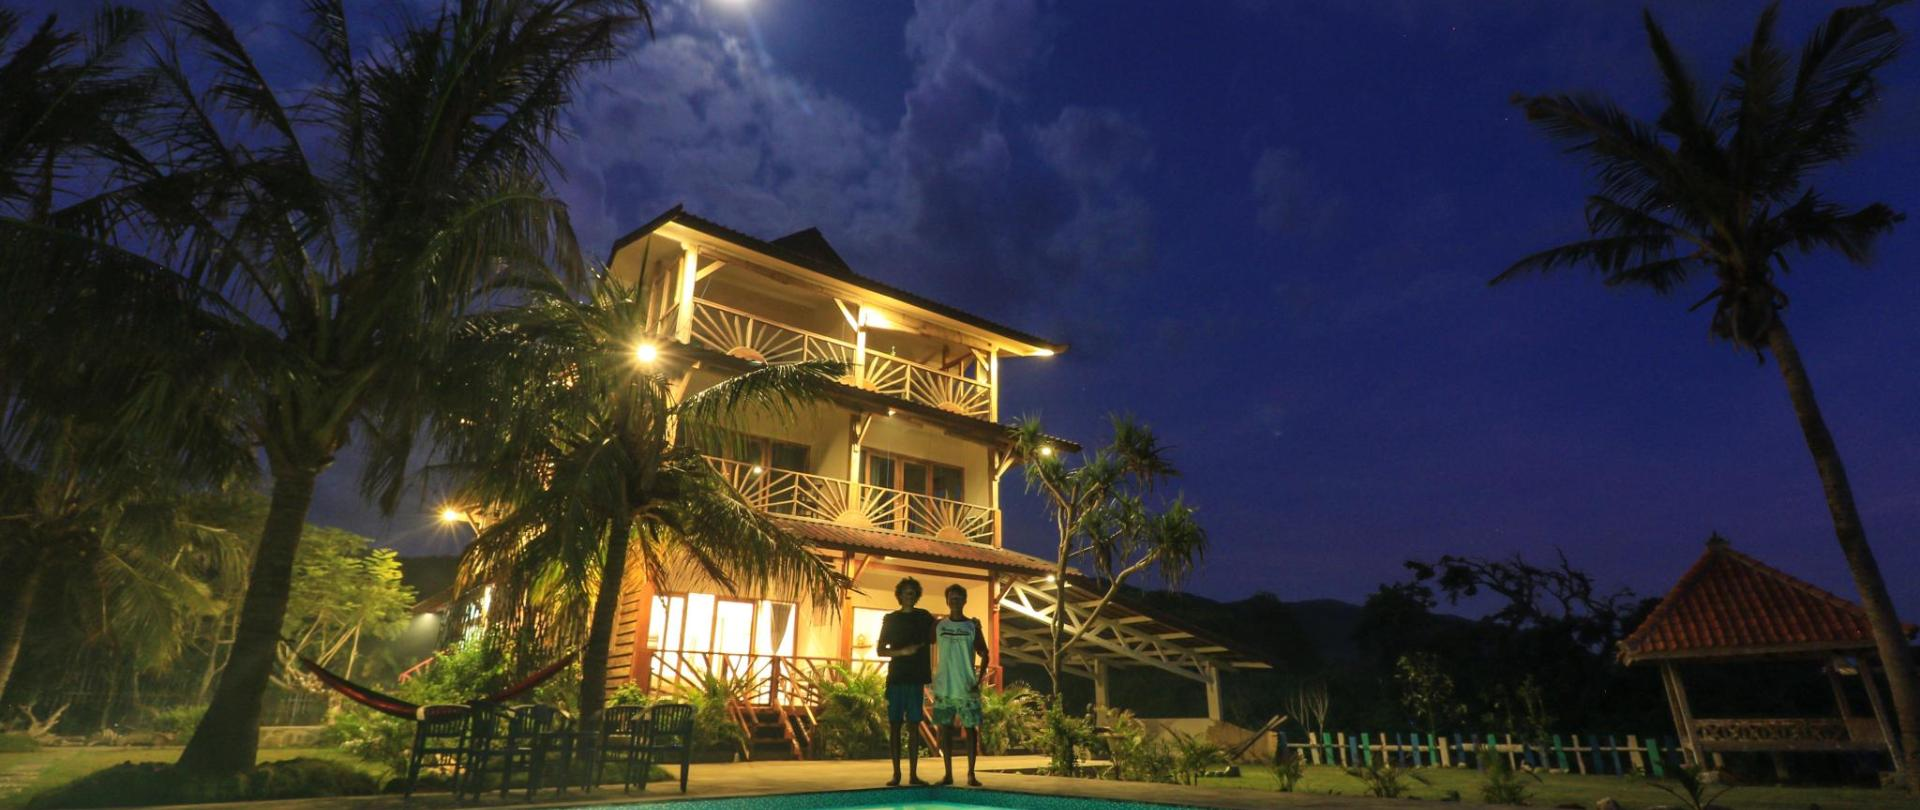 The Tree House Sumbawa